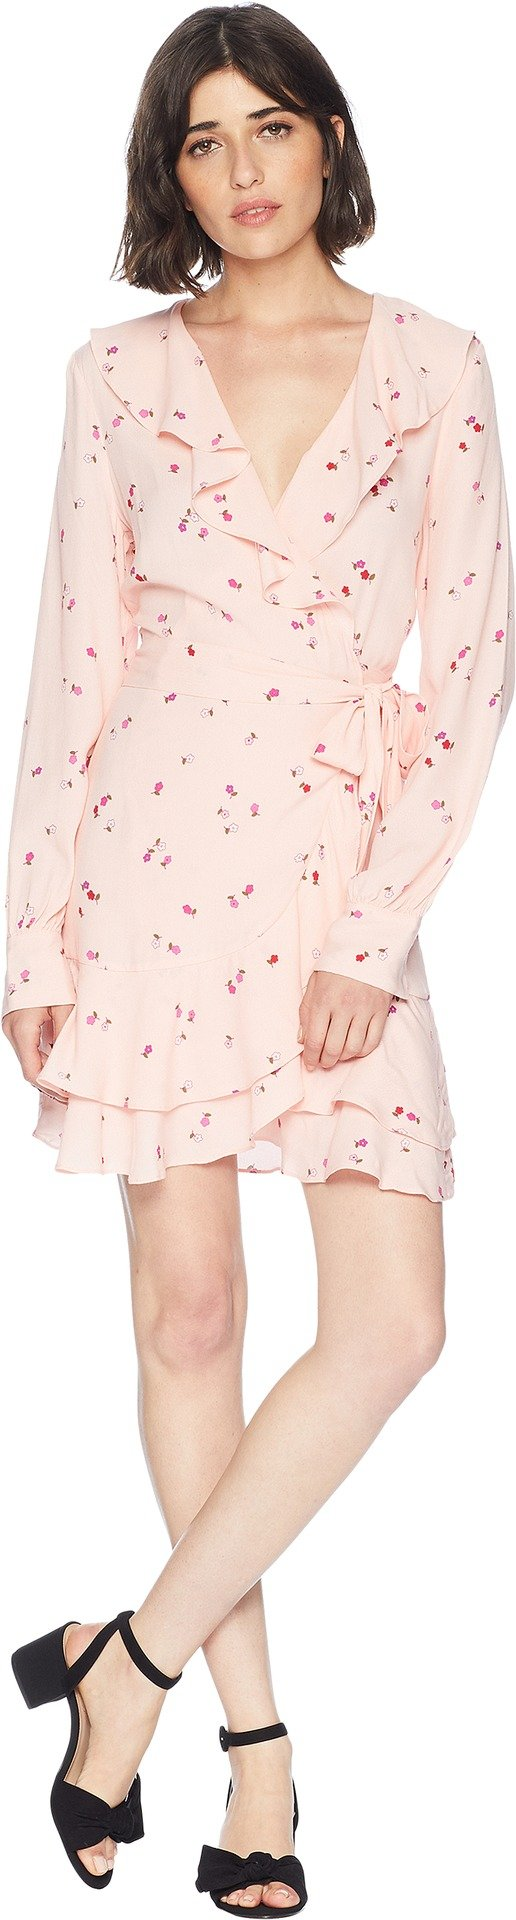 Juicy Couture Women's Rose Floral Flirty Wrap Dress Soft Glow Floral Riot Medium